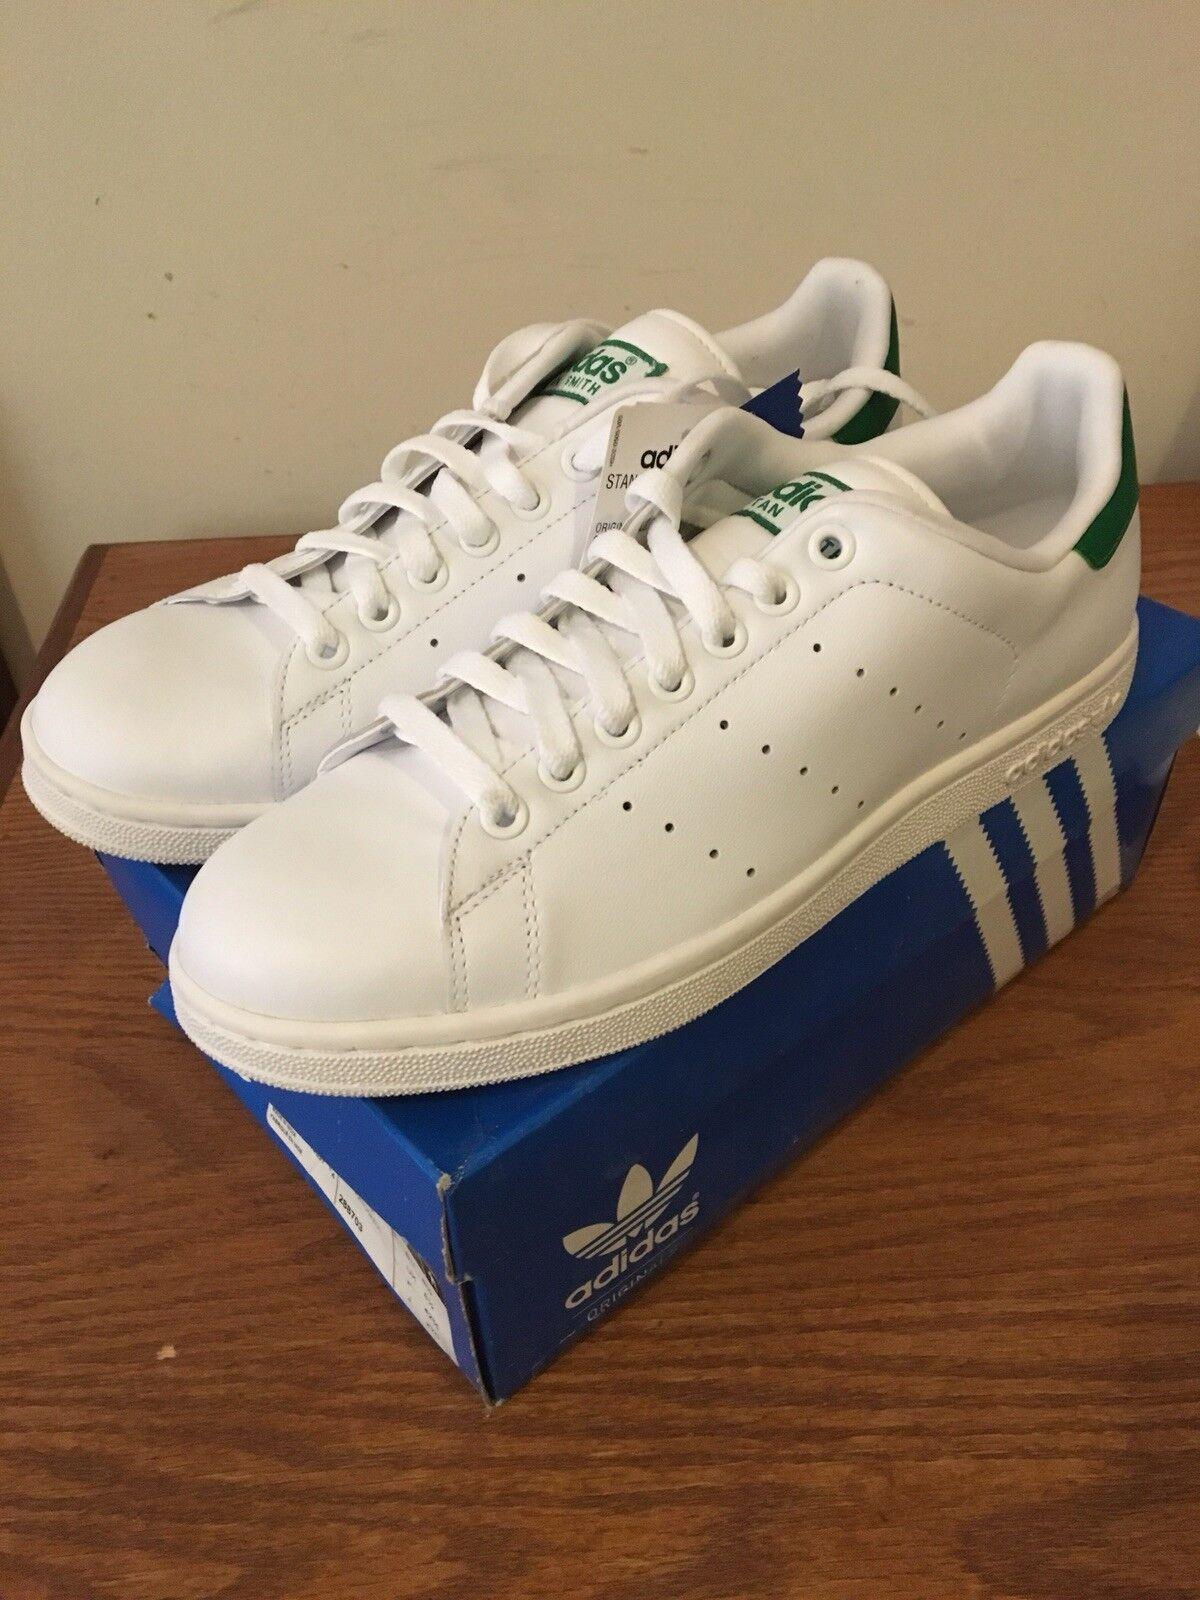 Adidas Originals Stan Smith 2 Green White Size 9 New